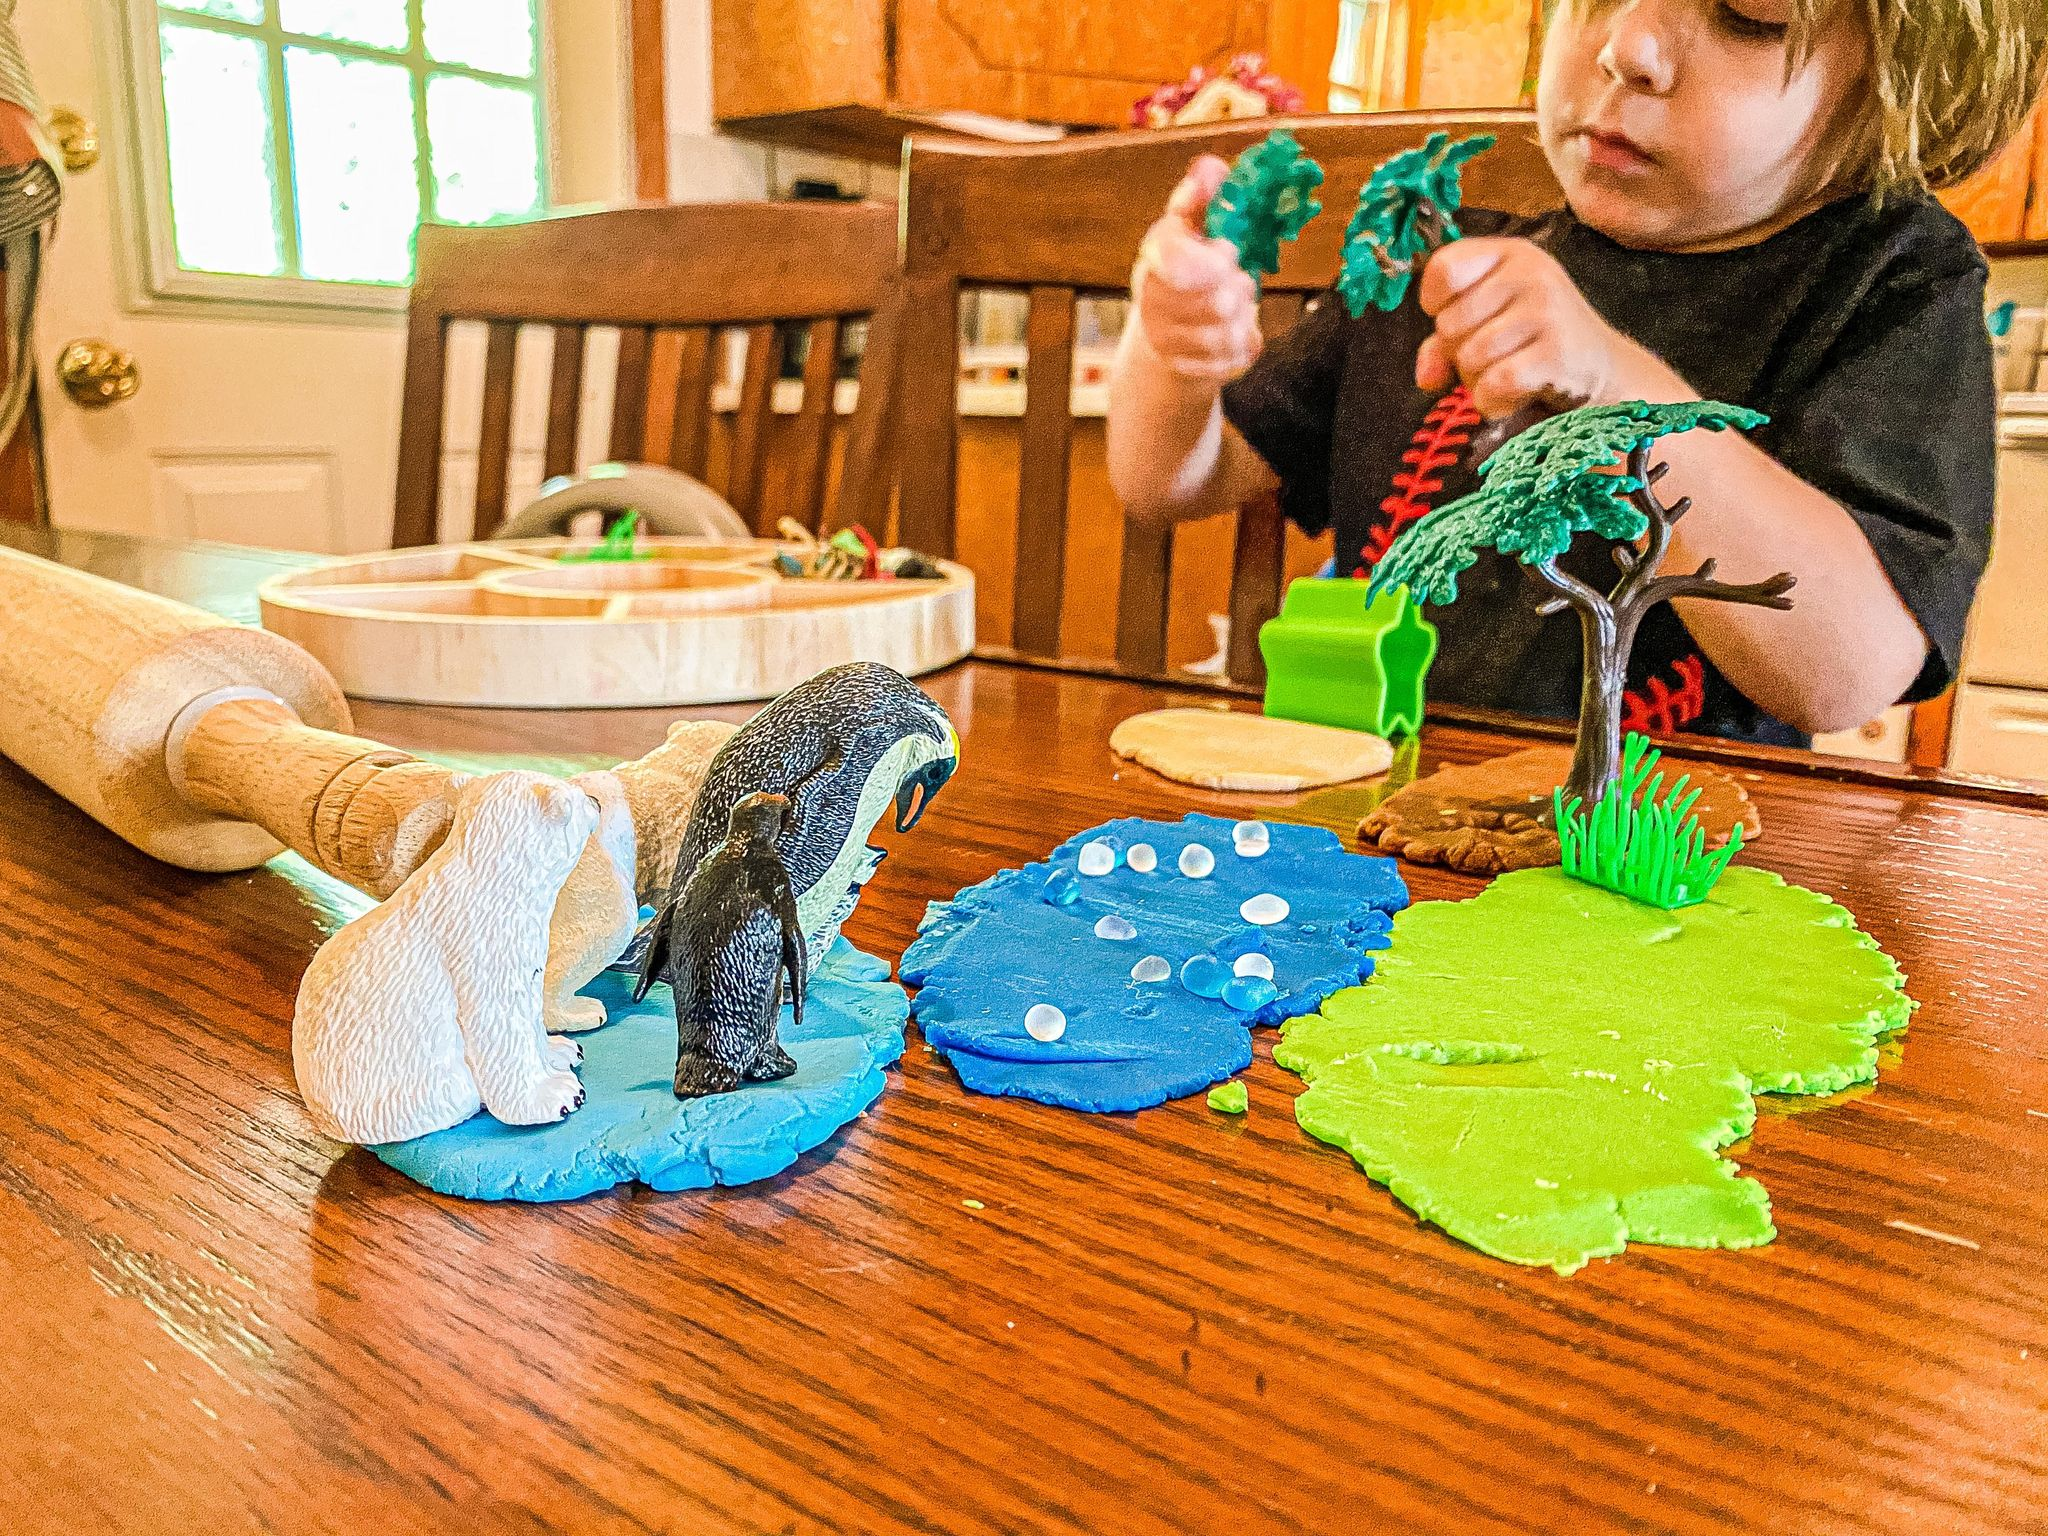 Animal Habitat Invitation to Play